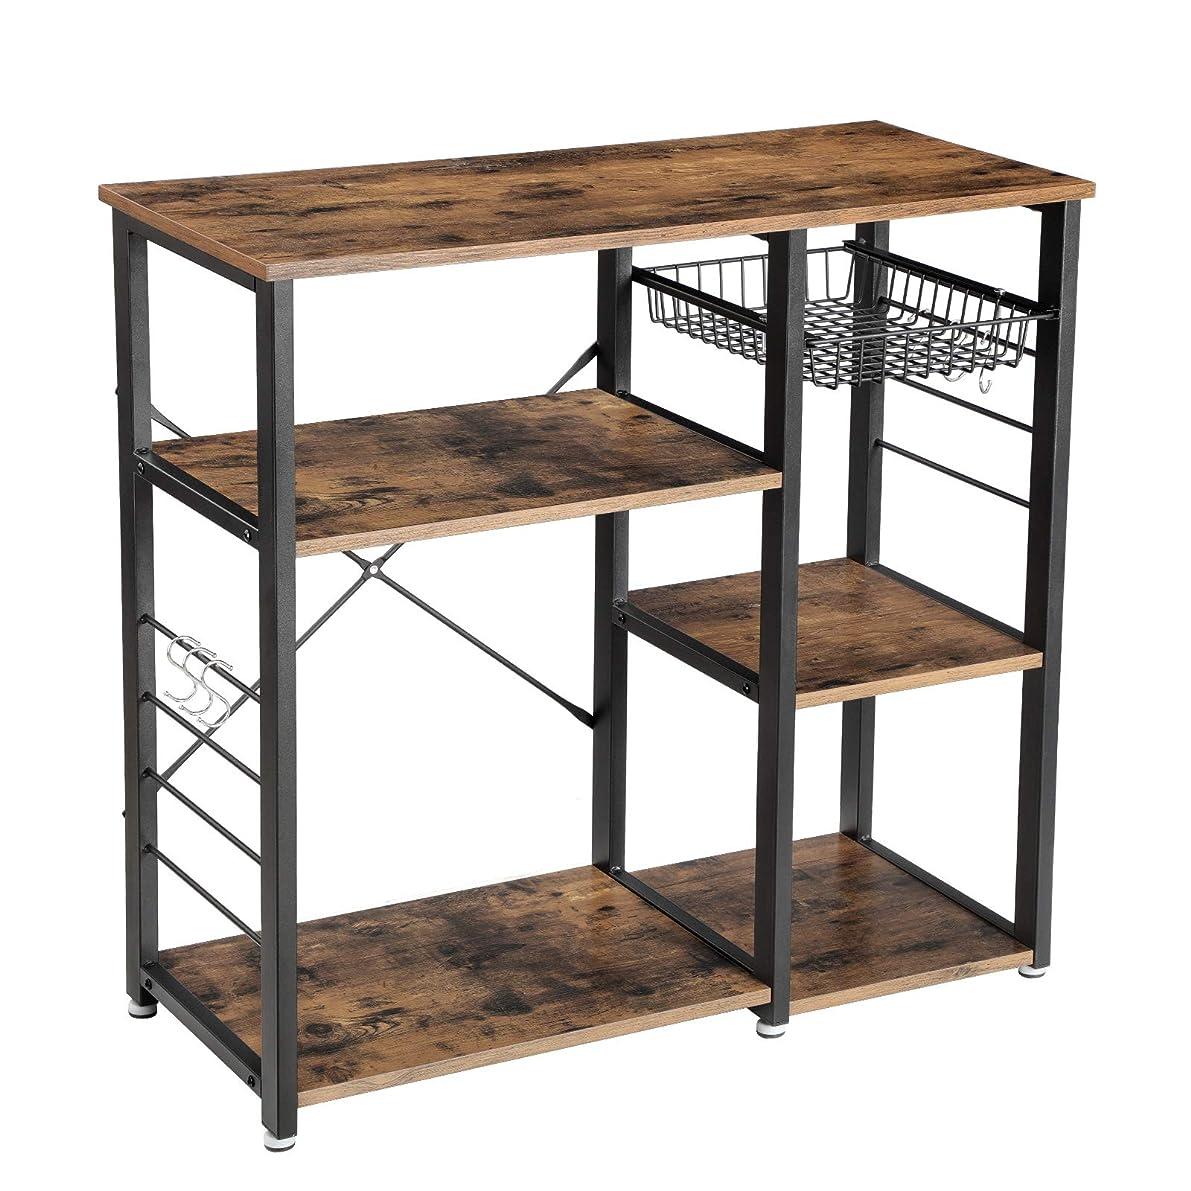 VASAGLE Industrial Kitchen Baker's Rack, Utility Storage Shelf, Microwave Oven Stand Metal Frame, Wire Basket 6 Hooks Mini Oven, Spices Utensils, Simple Assembly Wood Look UKKS90X